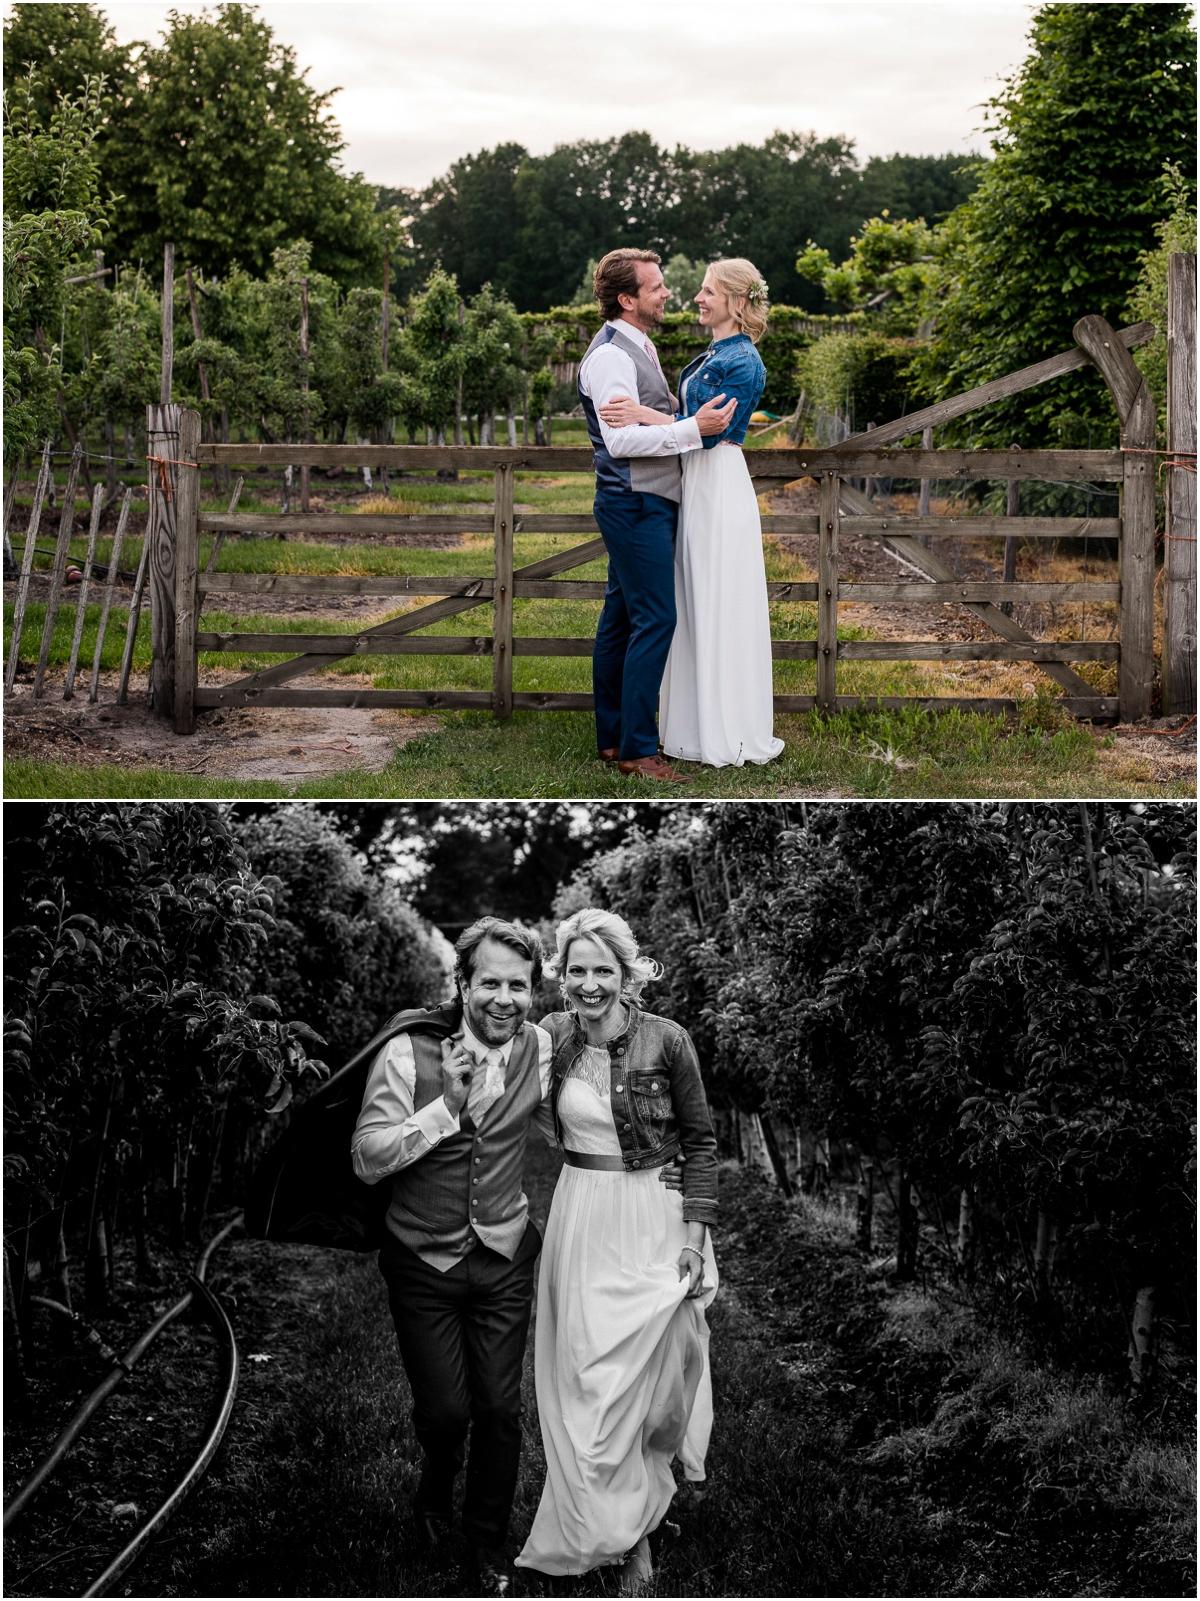 Dayofmylife-trouwen-fruittuinverbeek-bruidsfotograaf-wedding-germany-dutch24